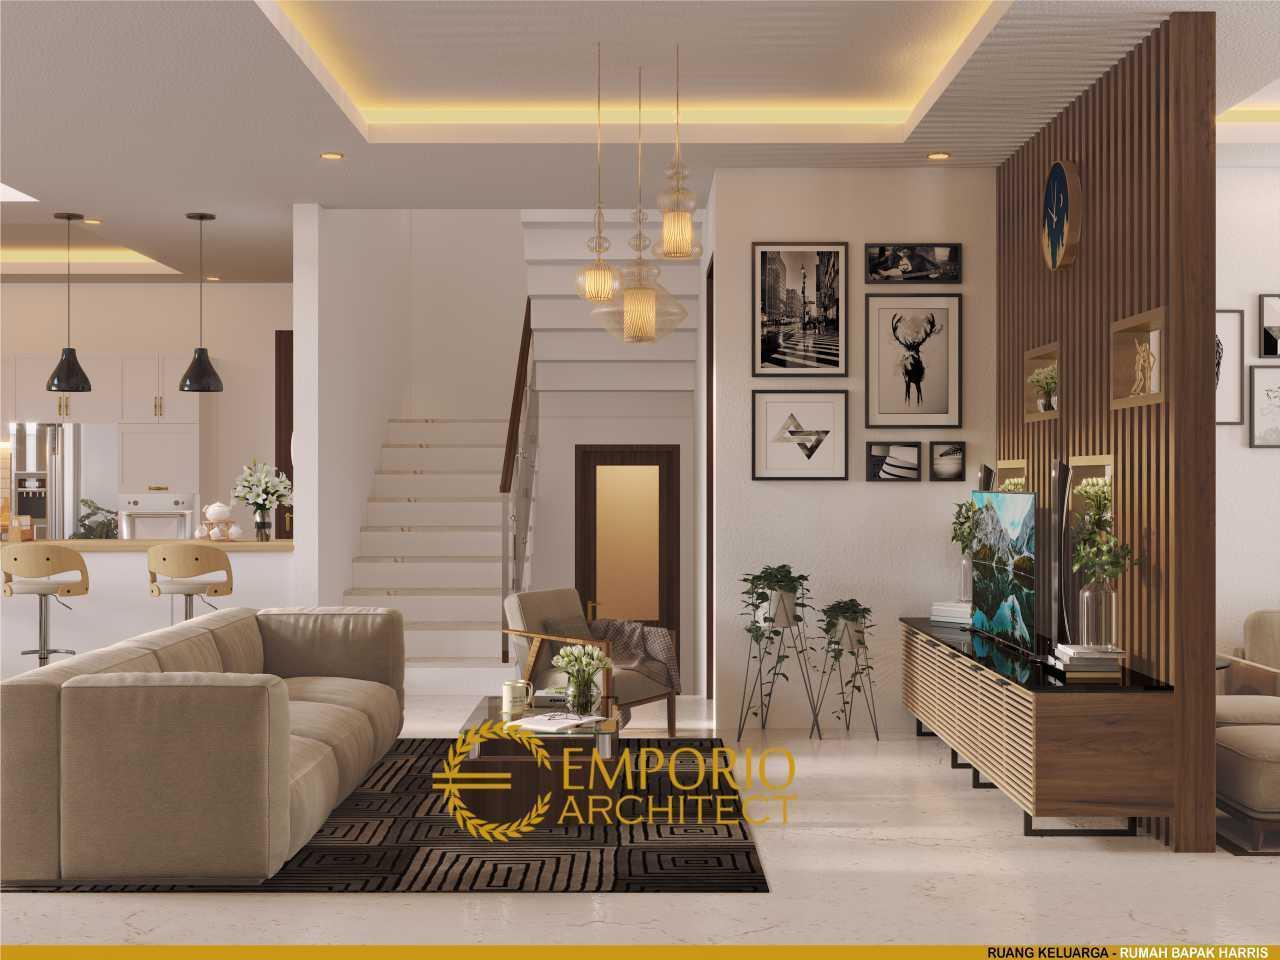 Emporio Architect Jasa Arsitek Riau Desain Rumah Modern 2 Lantai 758 @ Pekanbaru, Riau Pekanbaru, Kota Pekanbaru, Riau, Indonesia Pekanbaru, Kota Pekanbaru, Riau, Indonesia Emporio-Architect-Jasa-Arsitek-Riau-Desain-Rumah-Modern-2-Lantai-758-Pekanbaru-Riau  87022